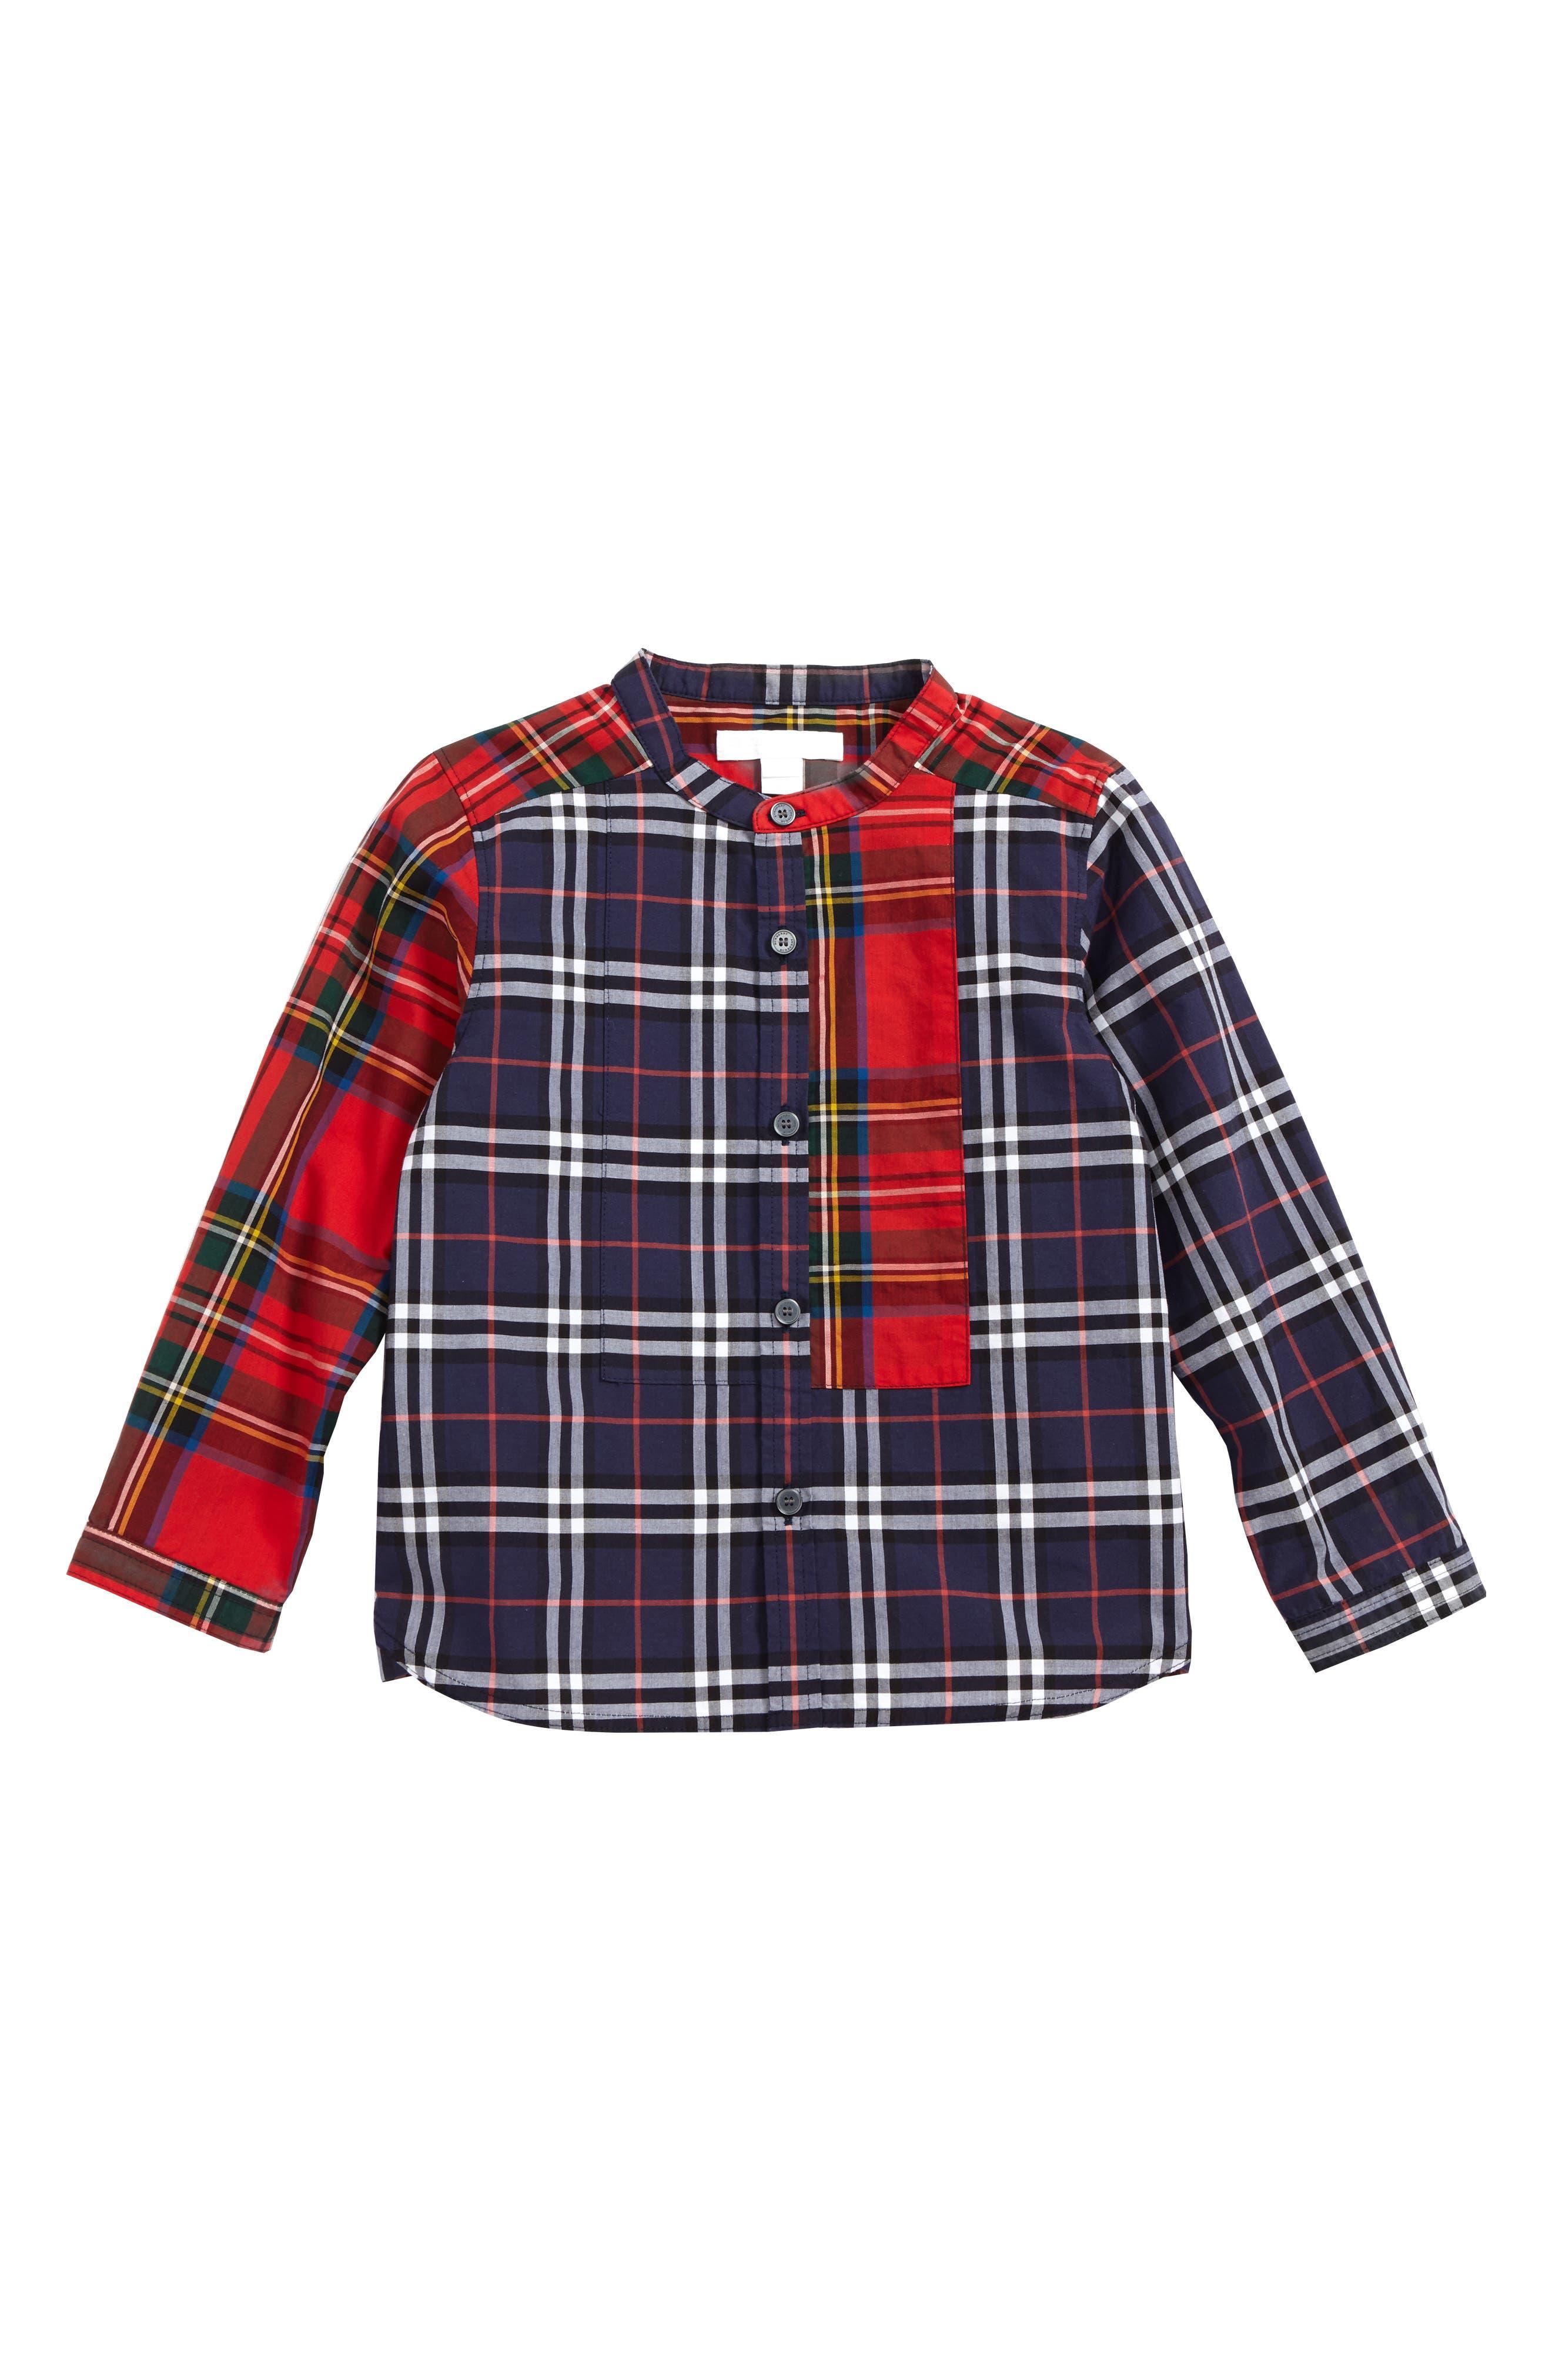 Argus Check Print Woven Shirt,                         Main,                         color, Navy